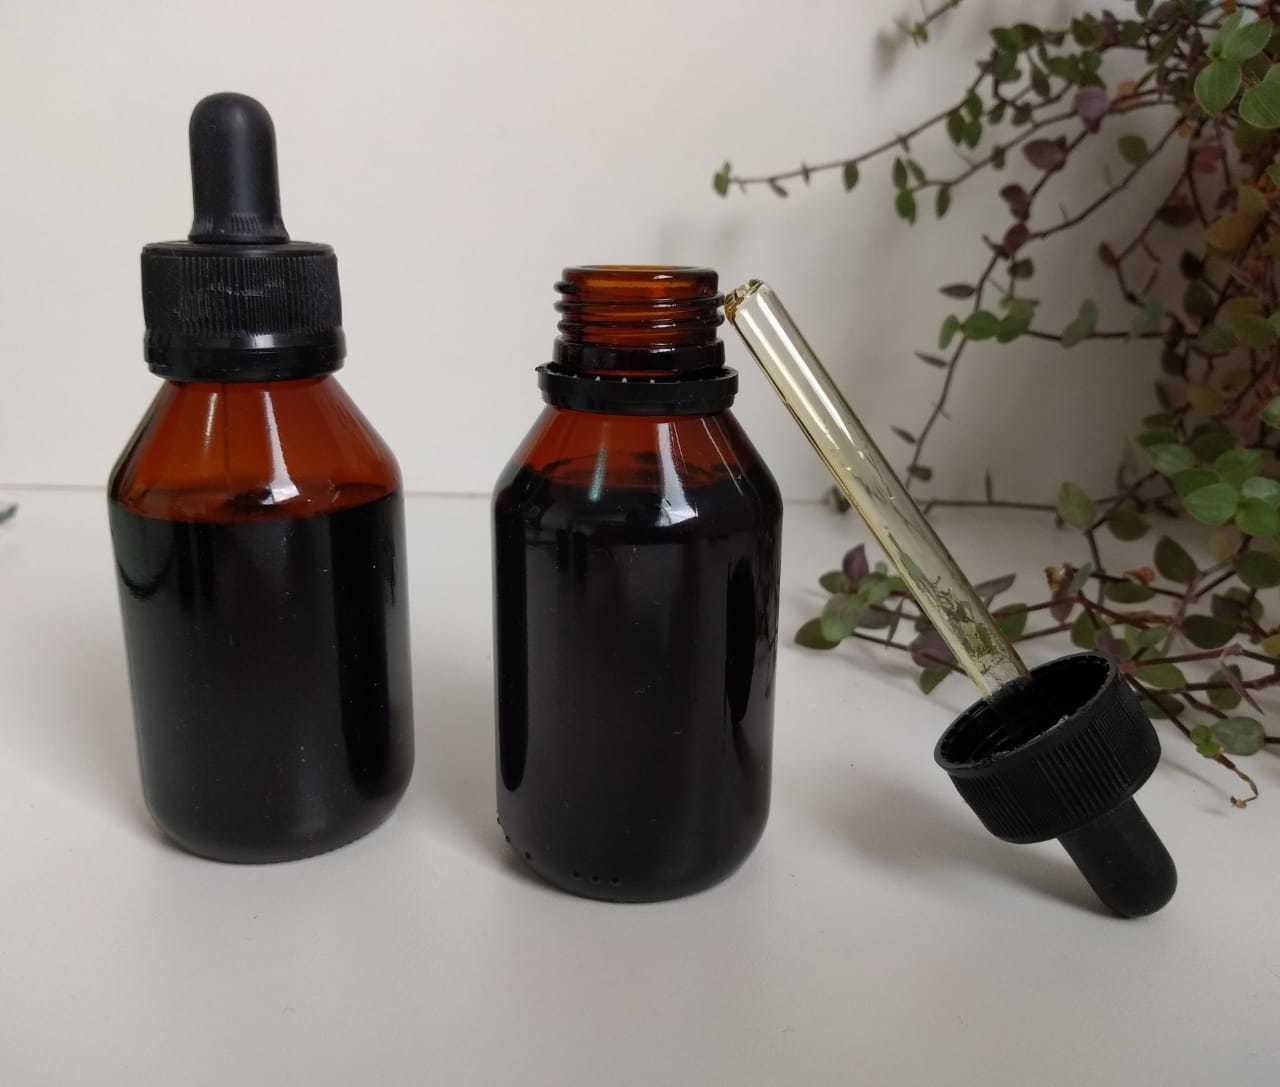 Tônico Artesanal Capilar Anti-Queda - 60 ml